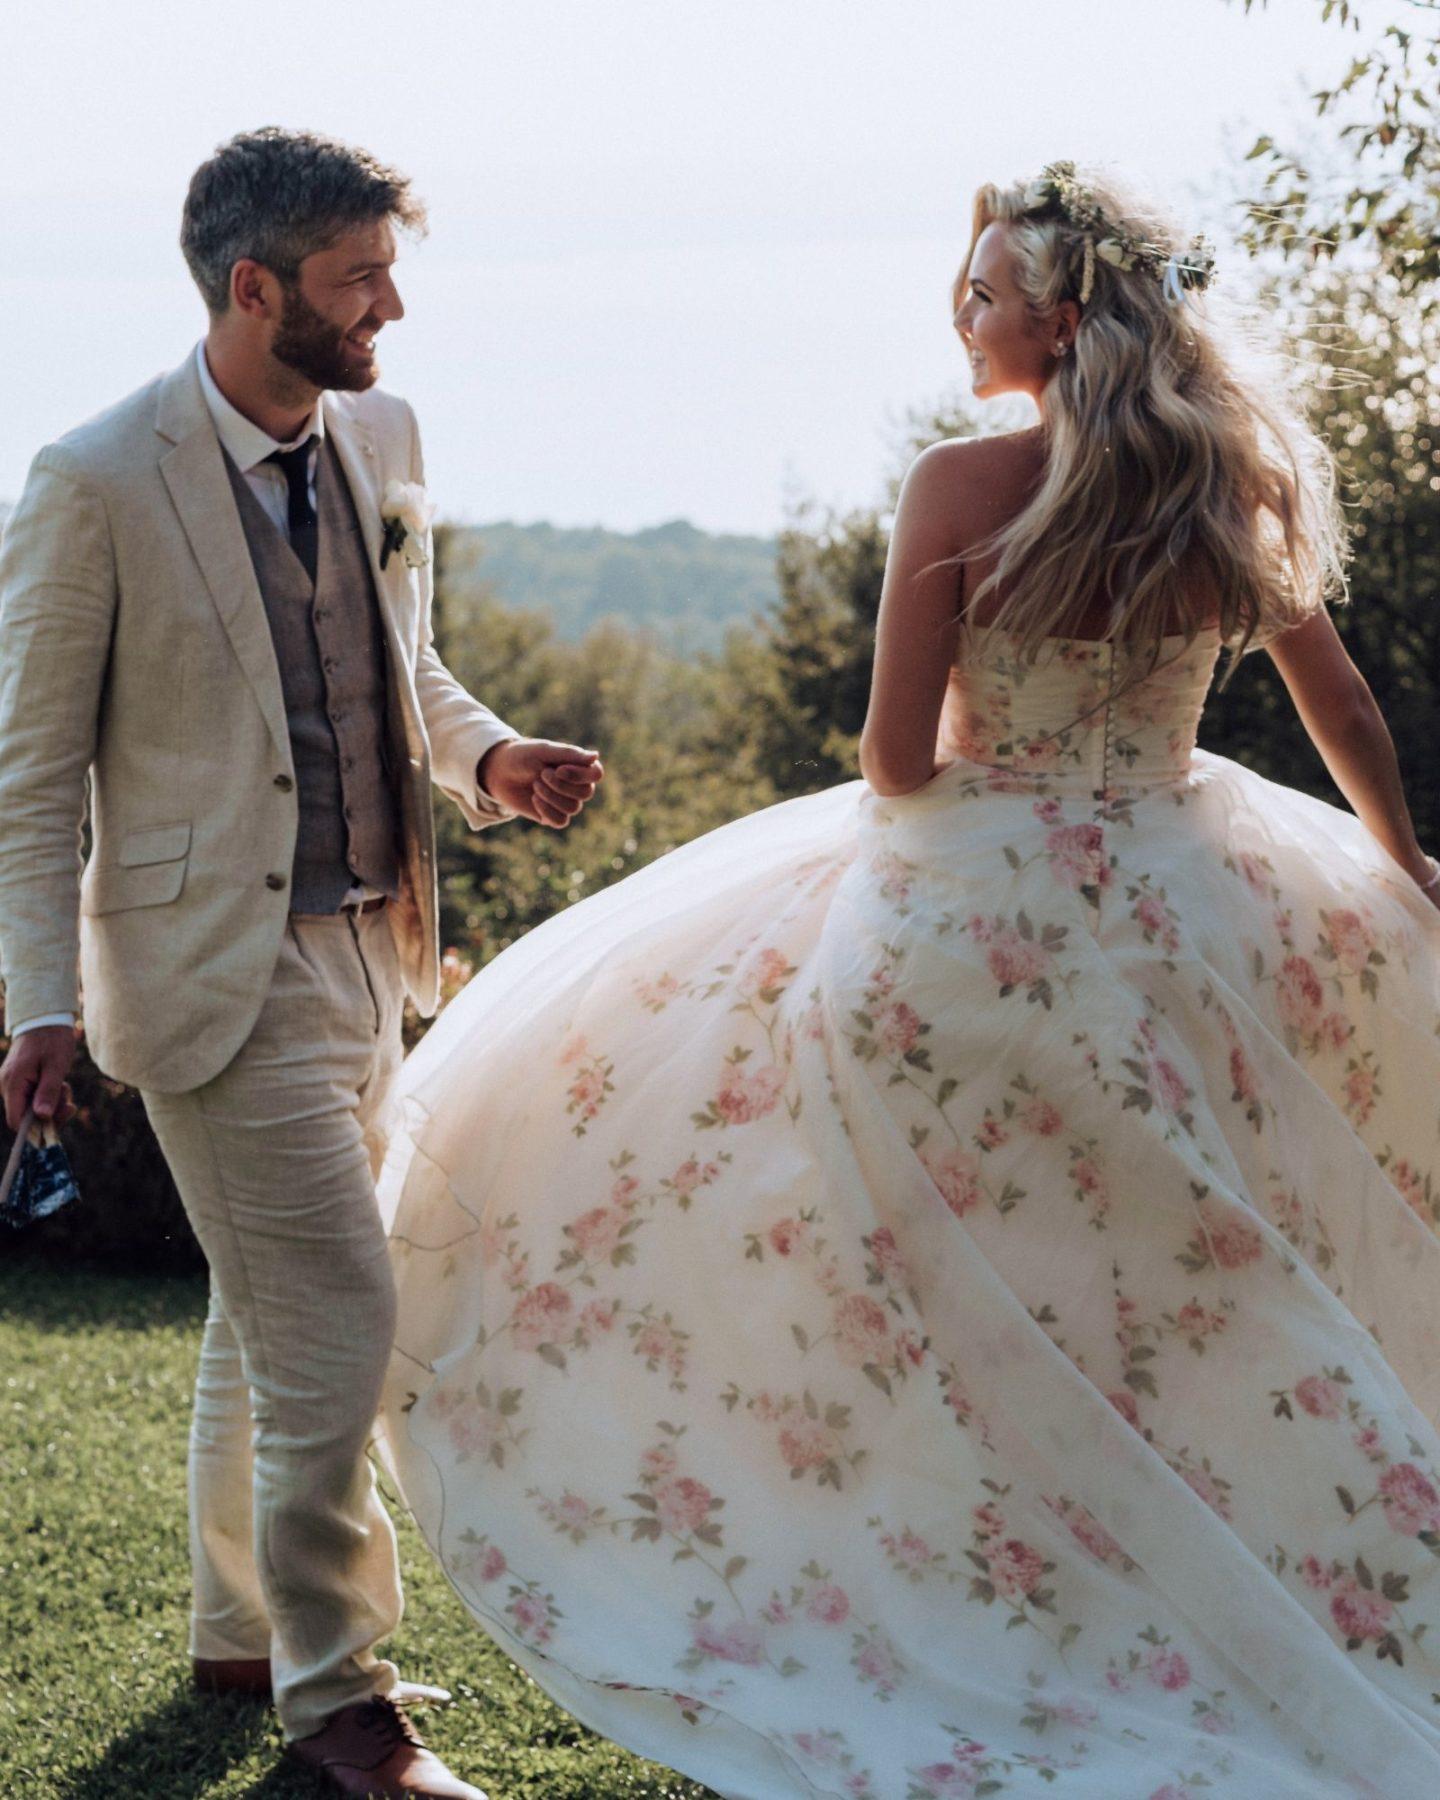 Rose dressing dress coloured wedding dress